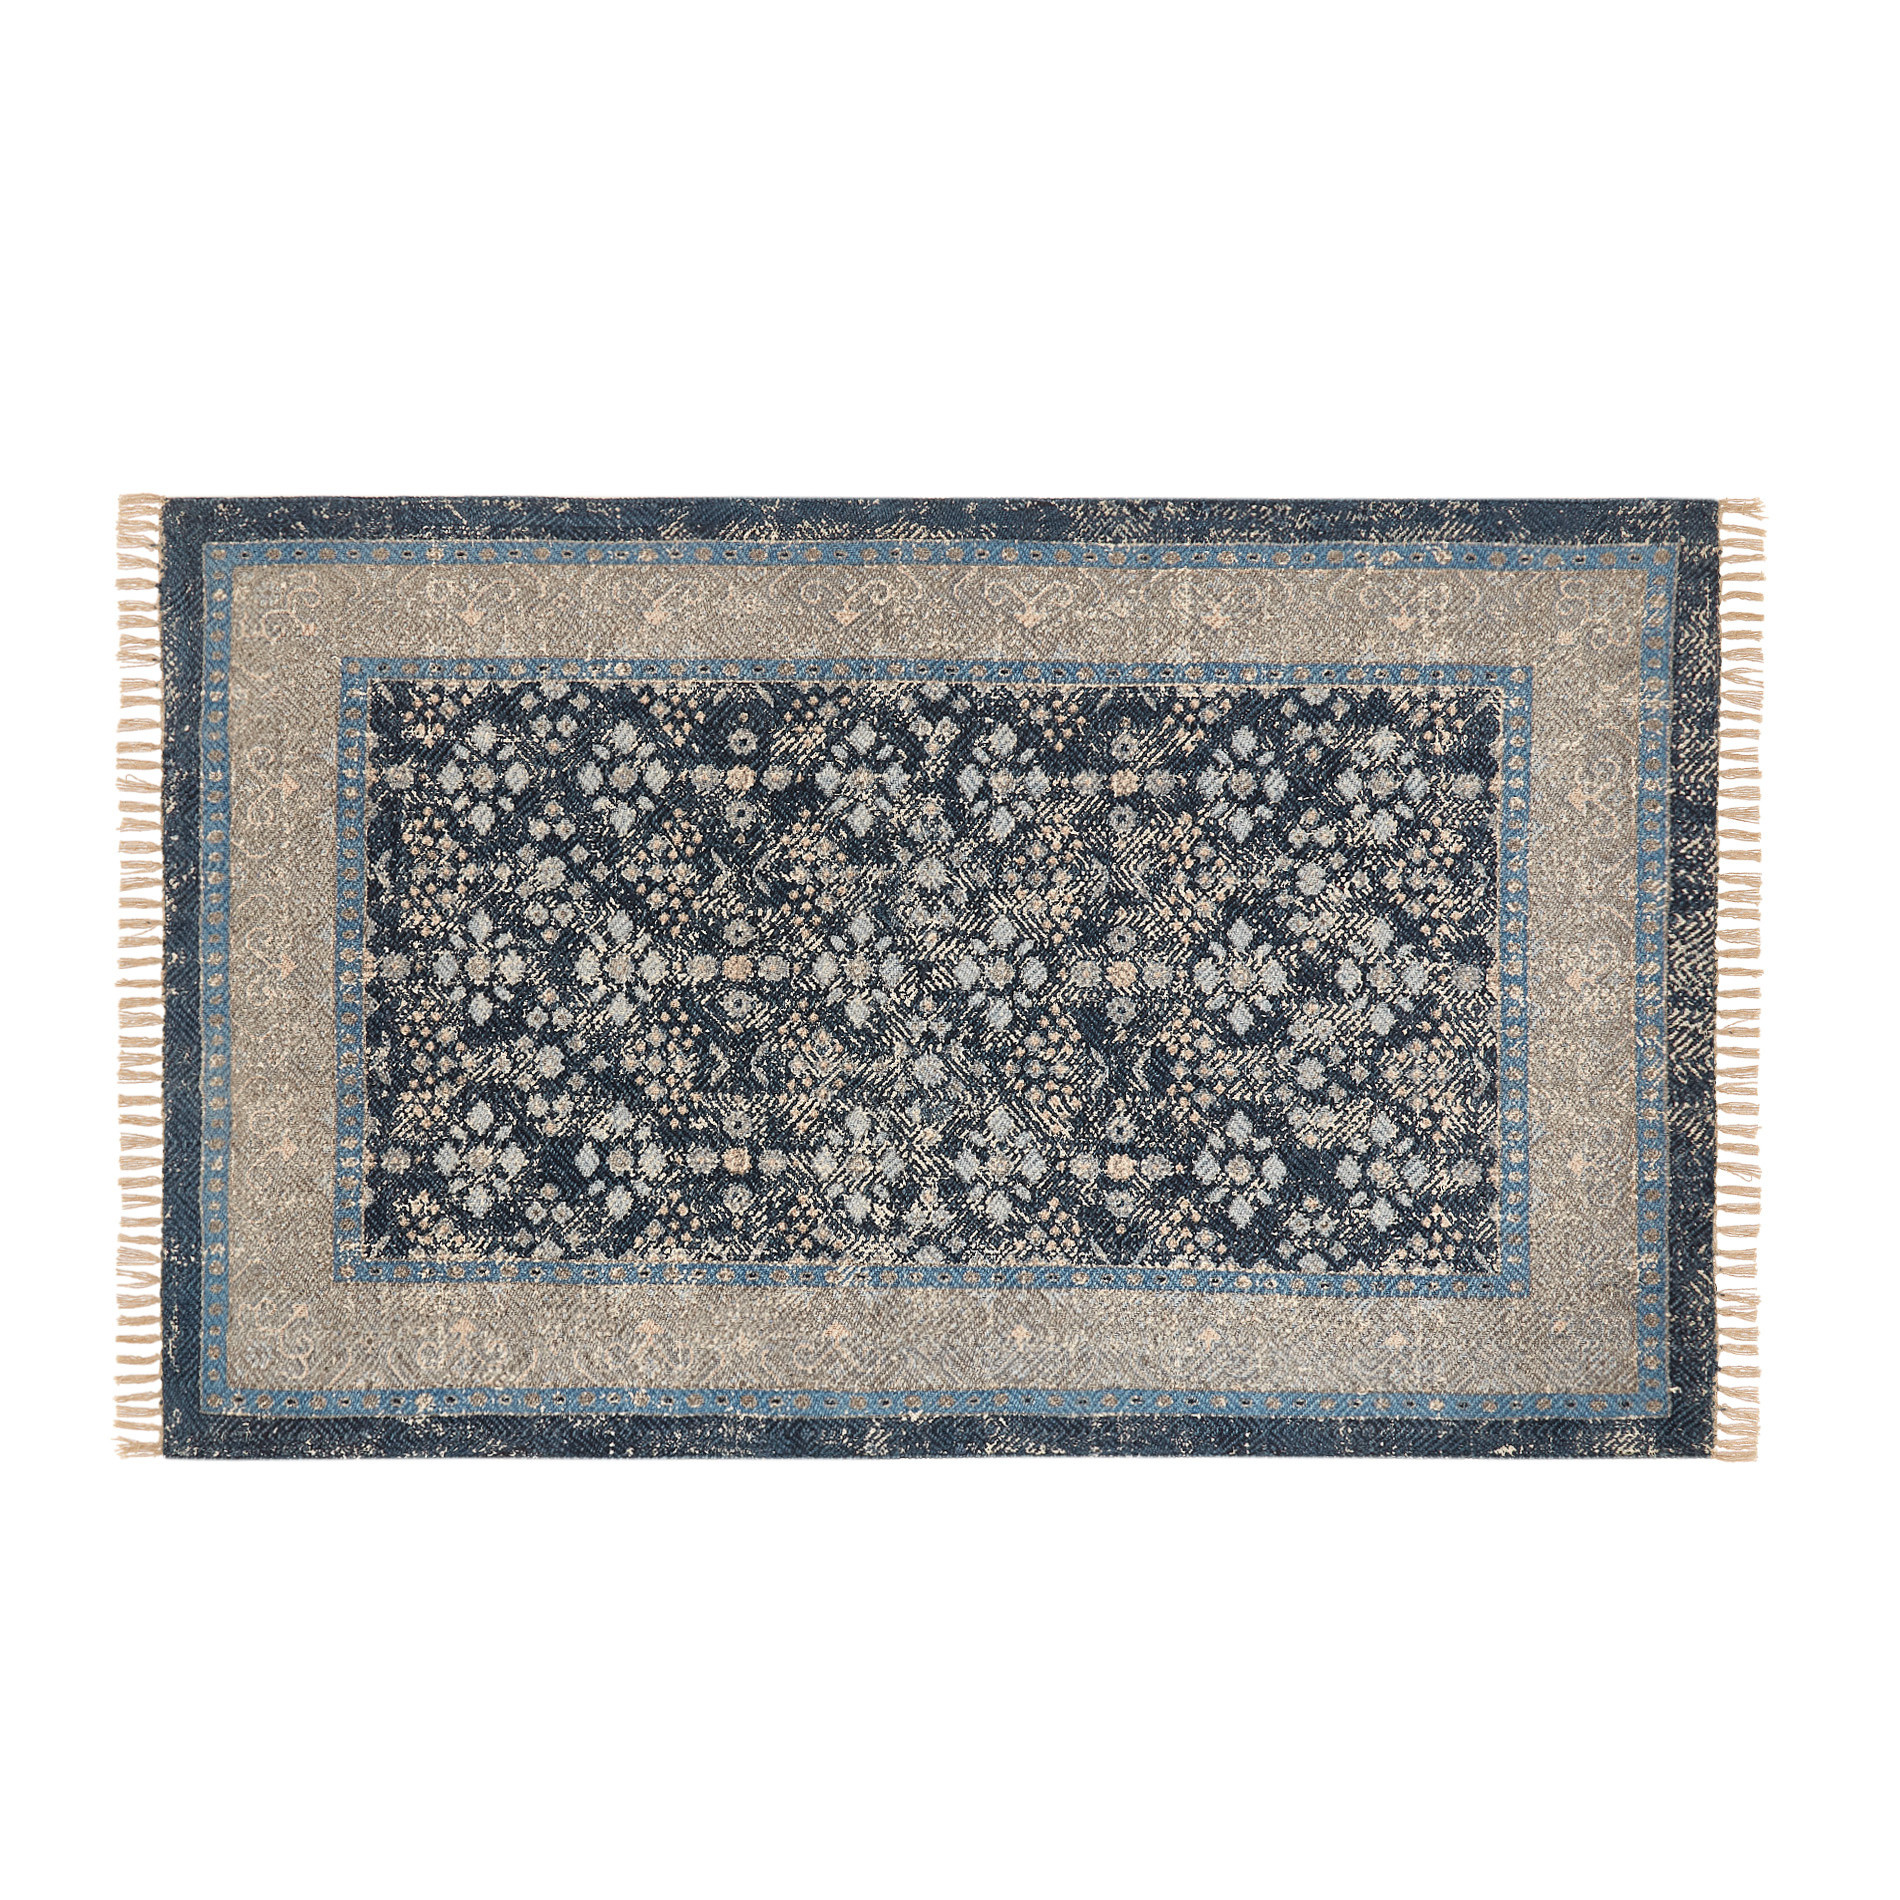 Tappeto cotone motivo floreale effetto vintage, Blu, large image number 0